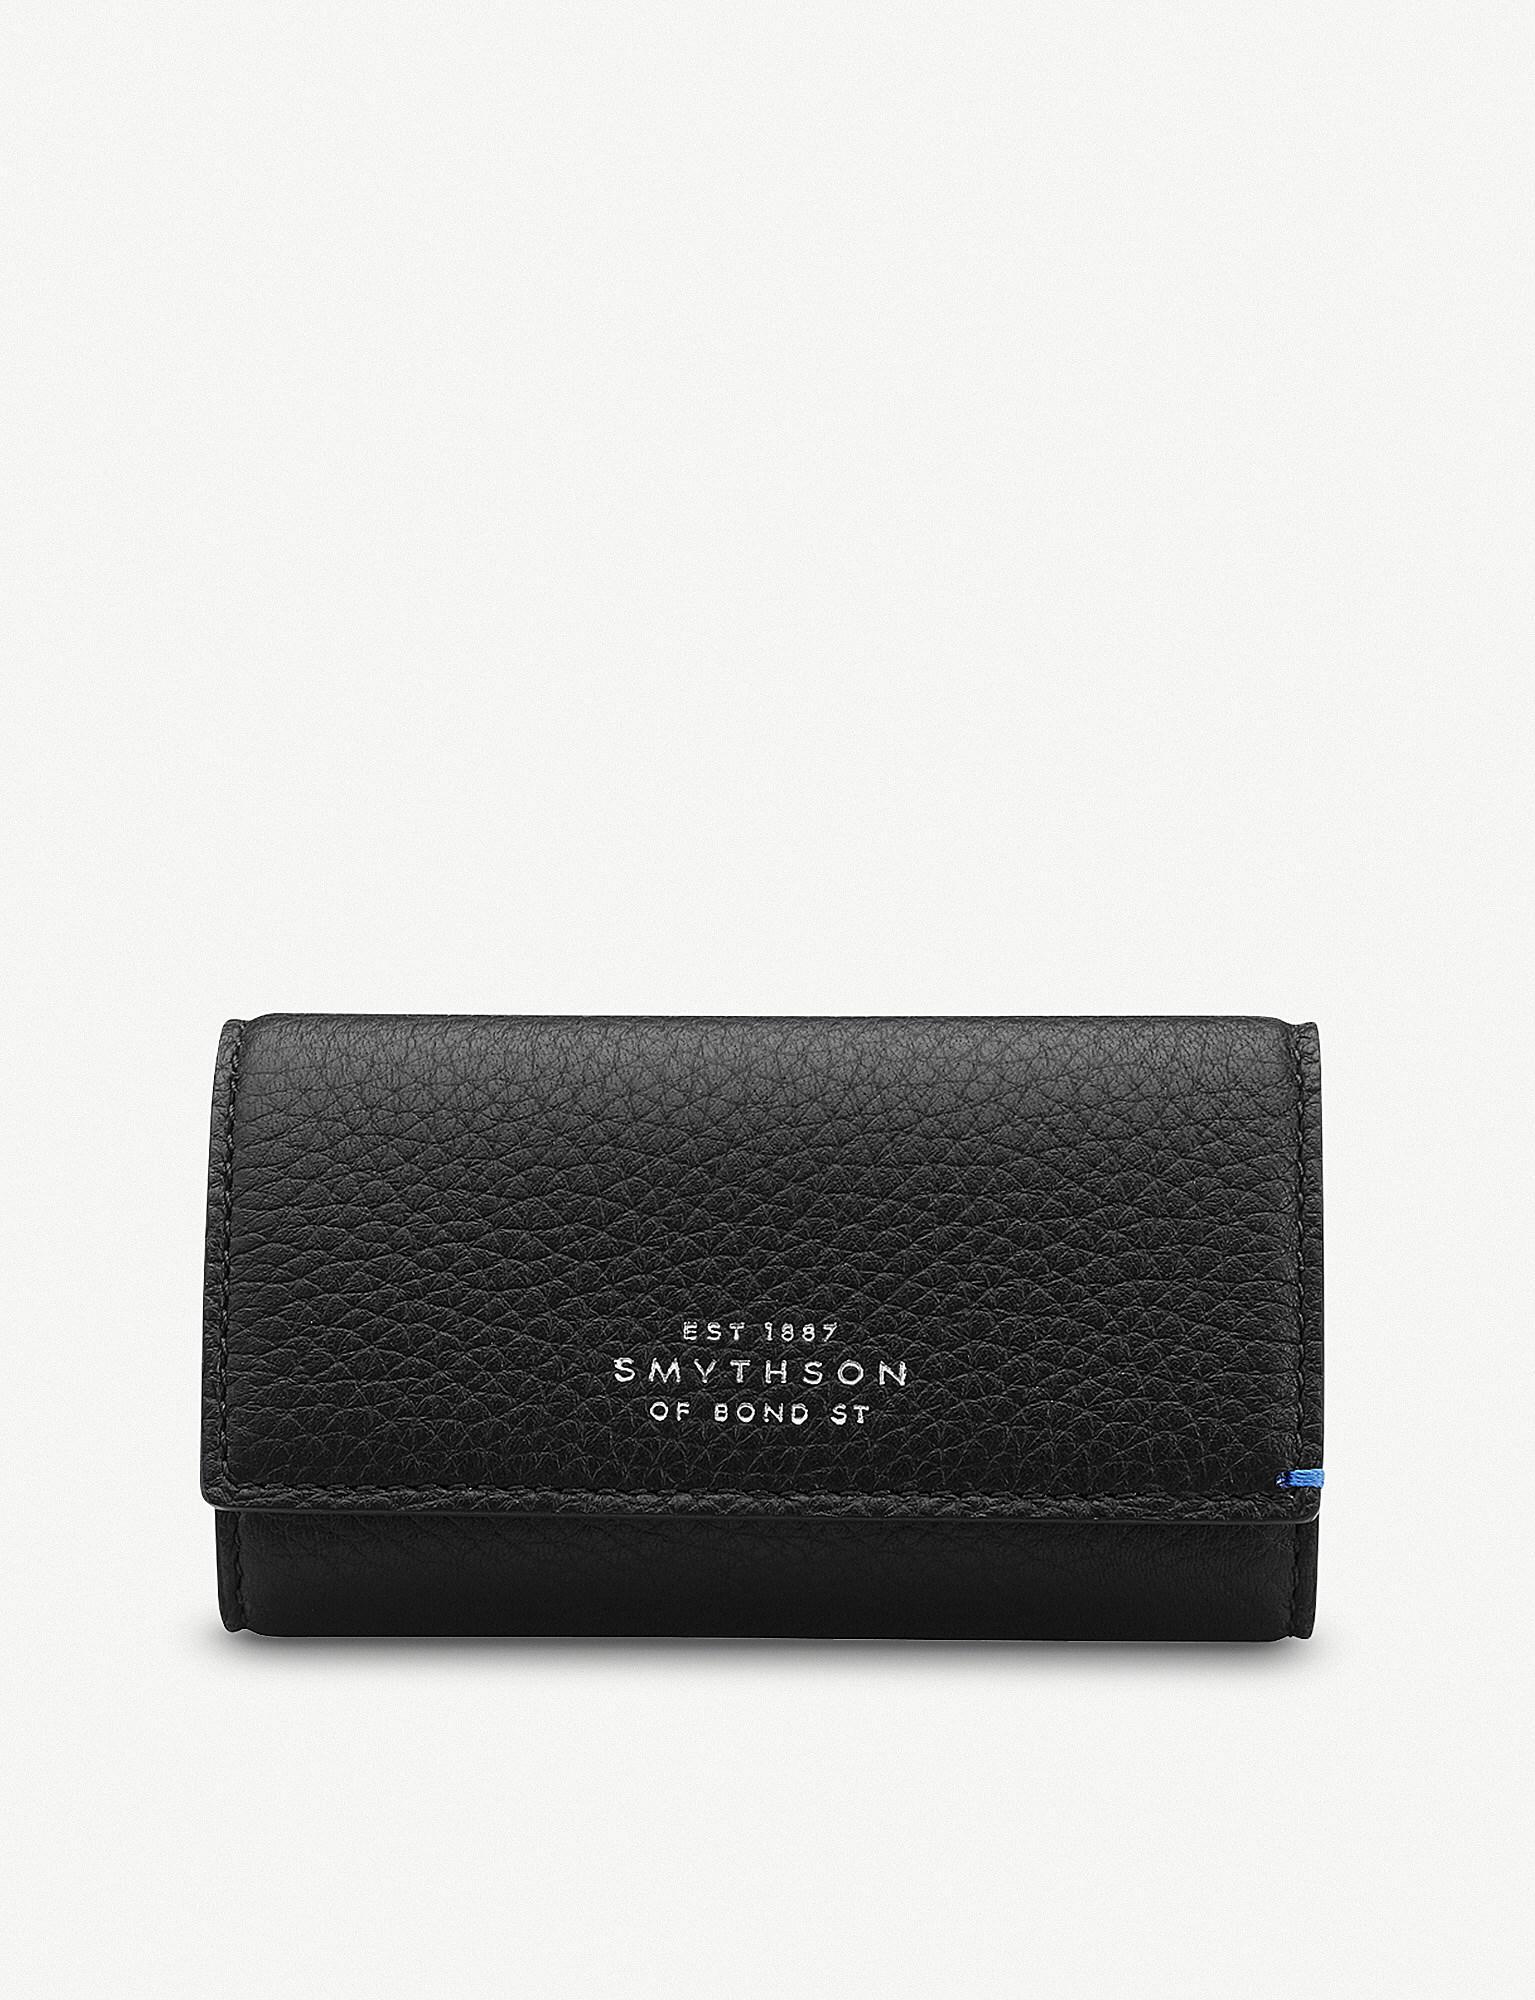 Lyst - Smythson Burlington Leather Key Holder in Black